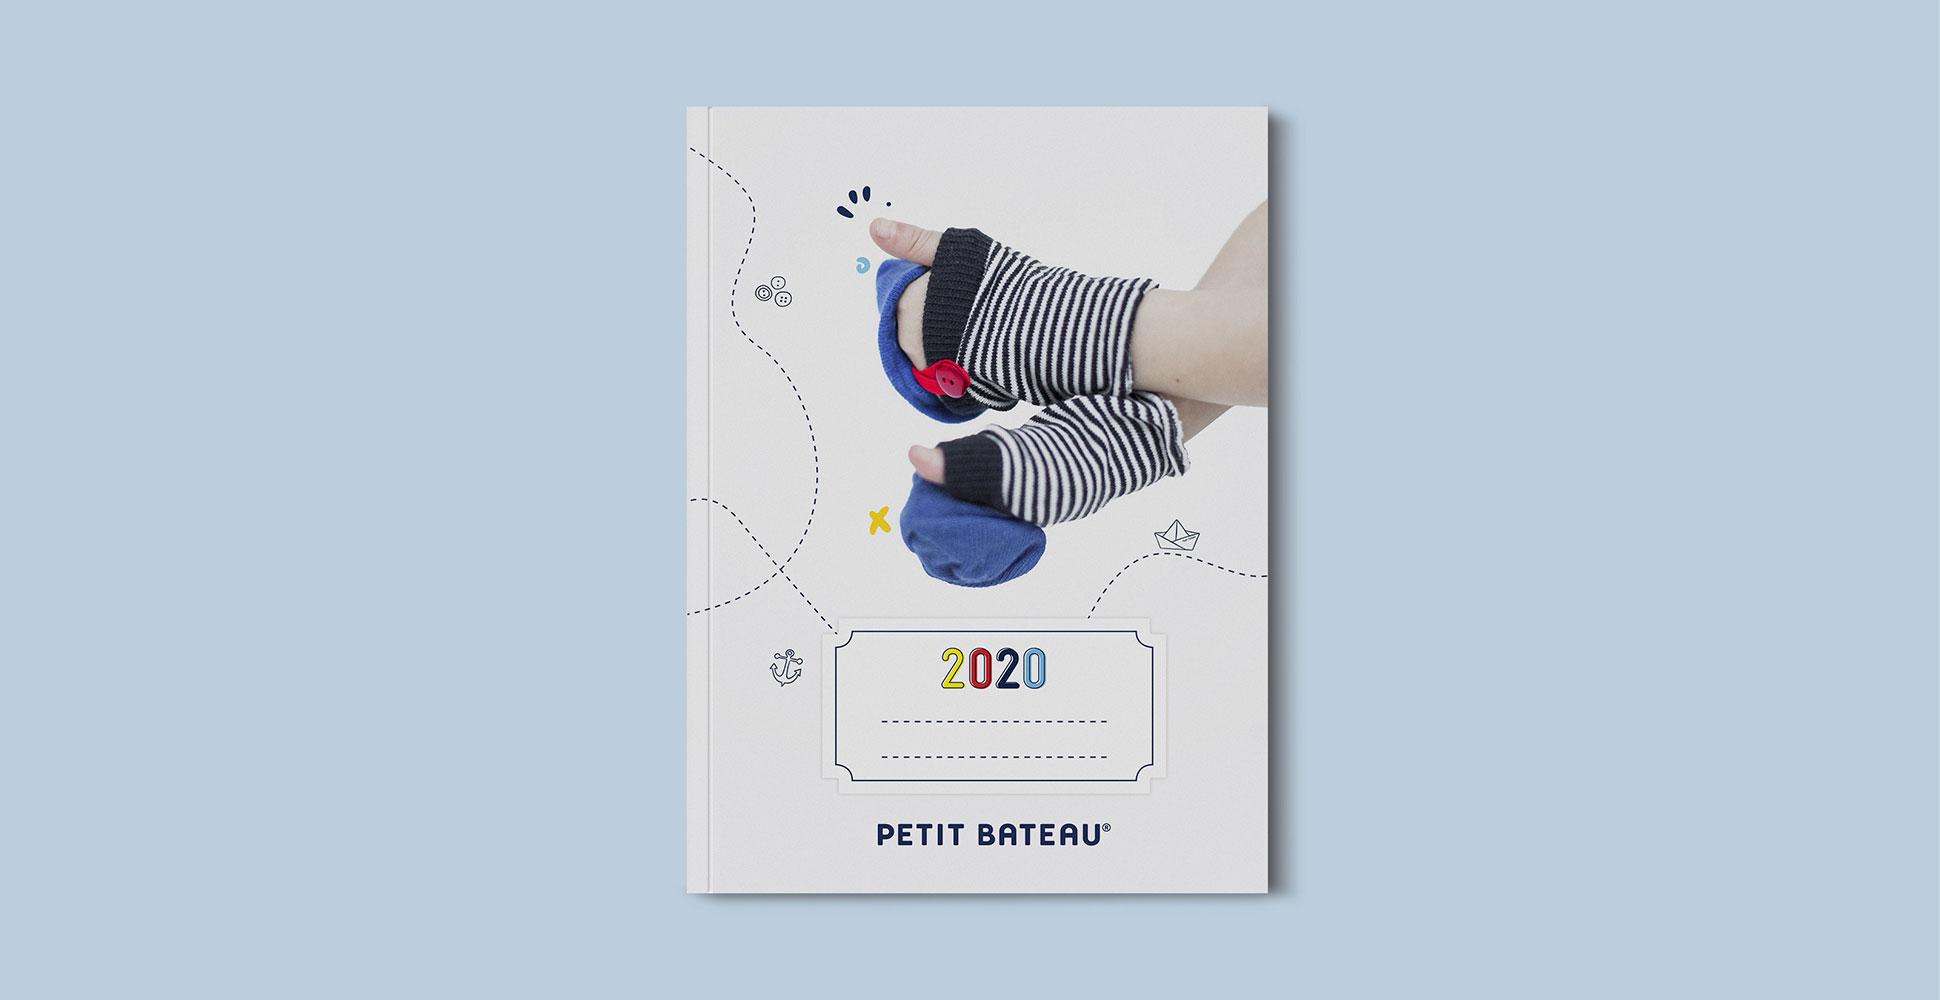 ikadia-portfolio-petit-bateau-16